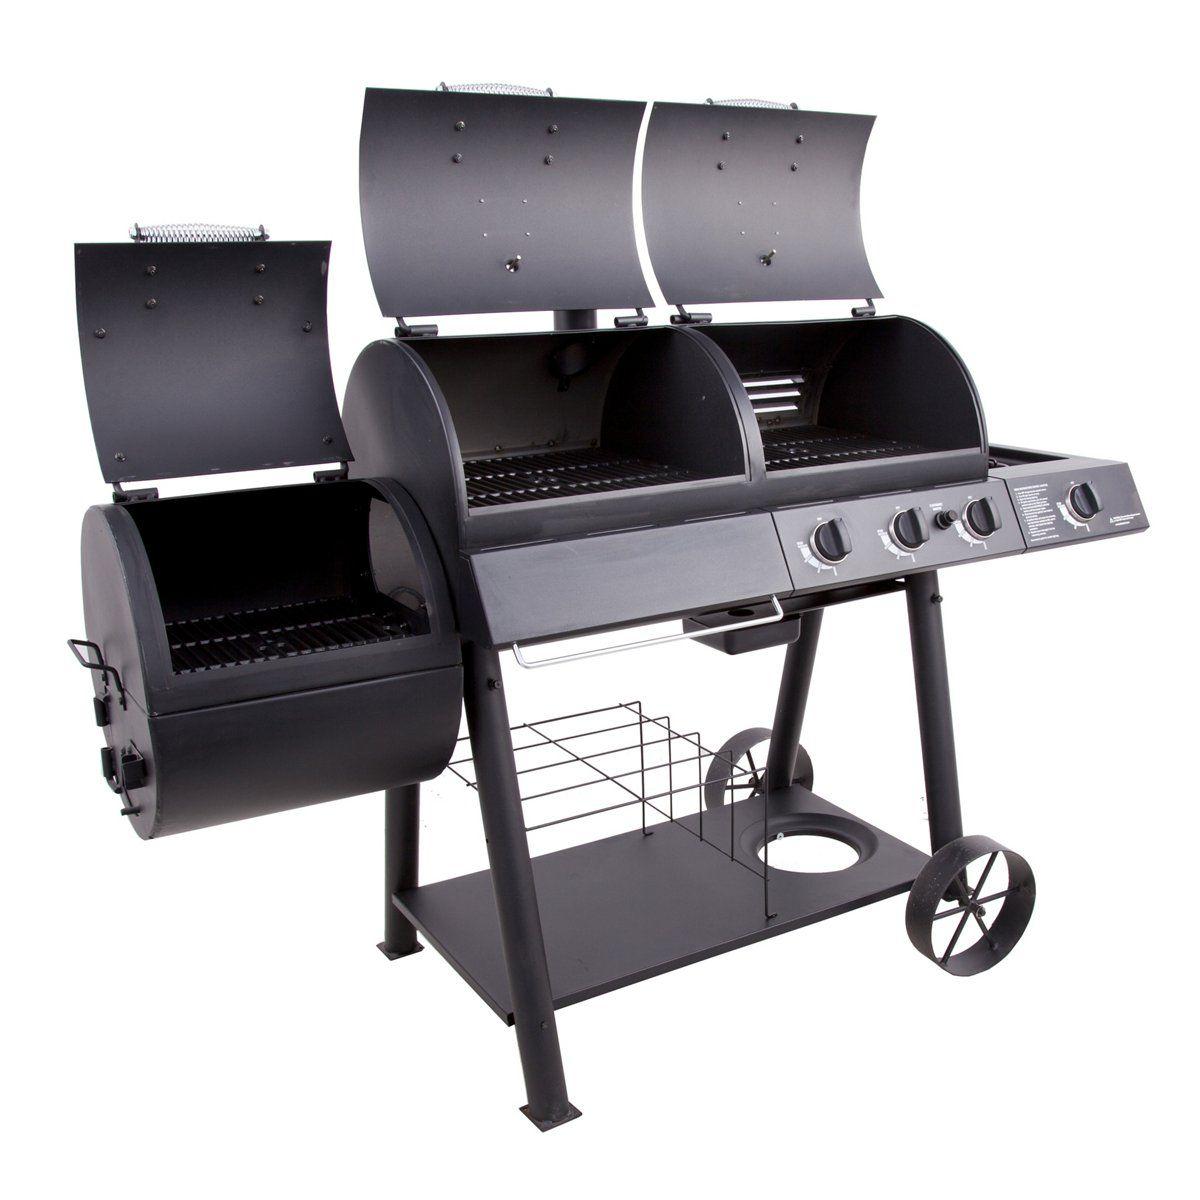 Oklahoma Joe's Longhorn Combo Grill and Smoker Bbq parts